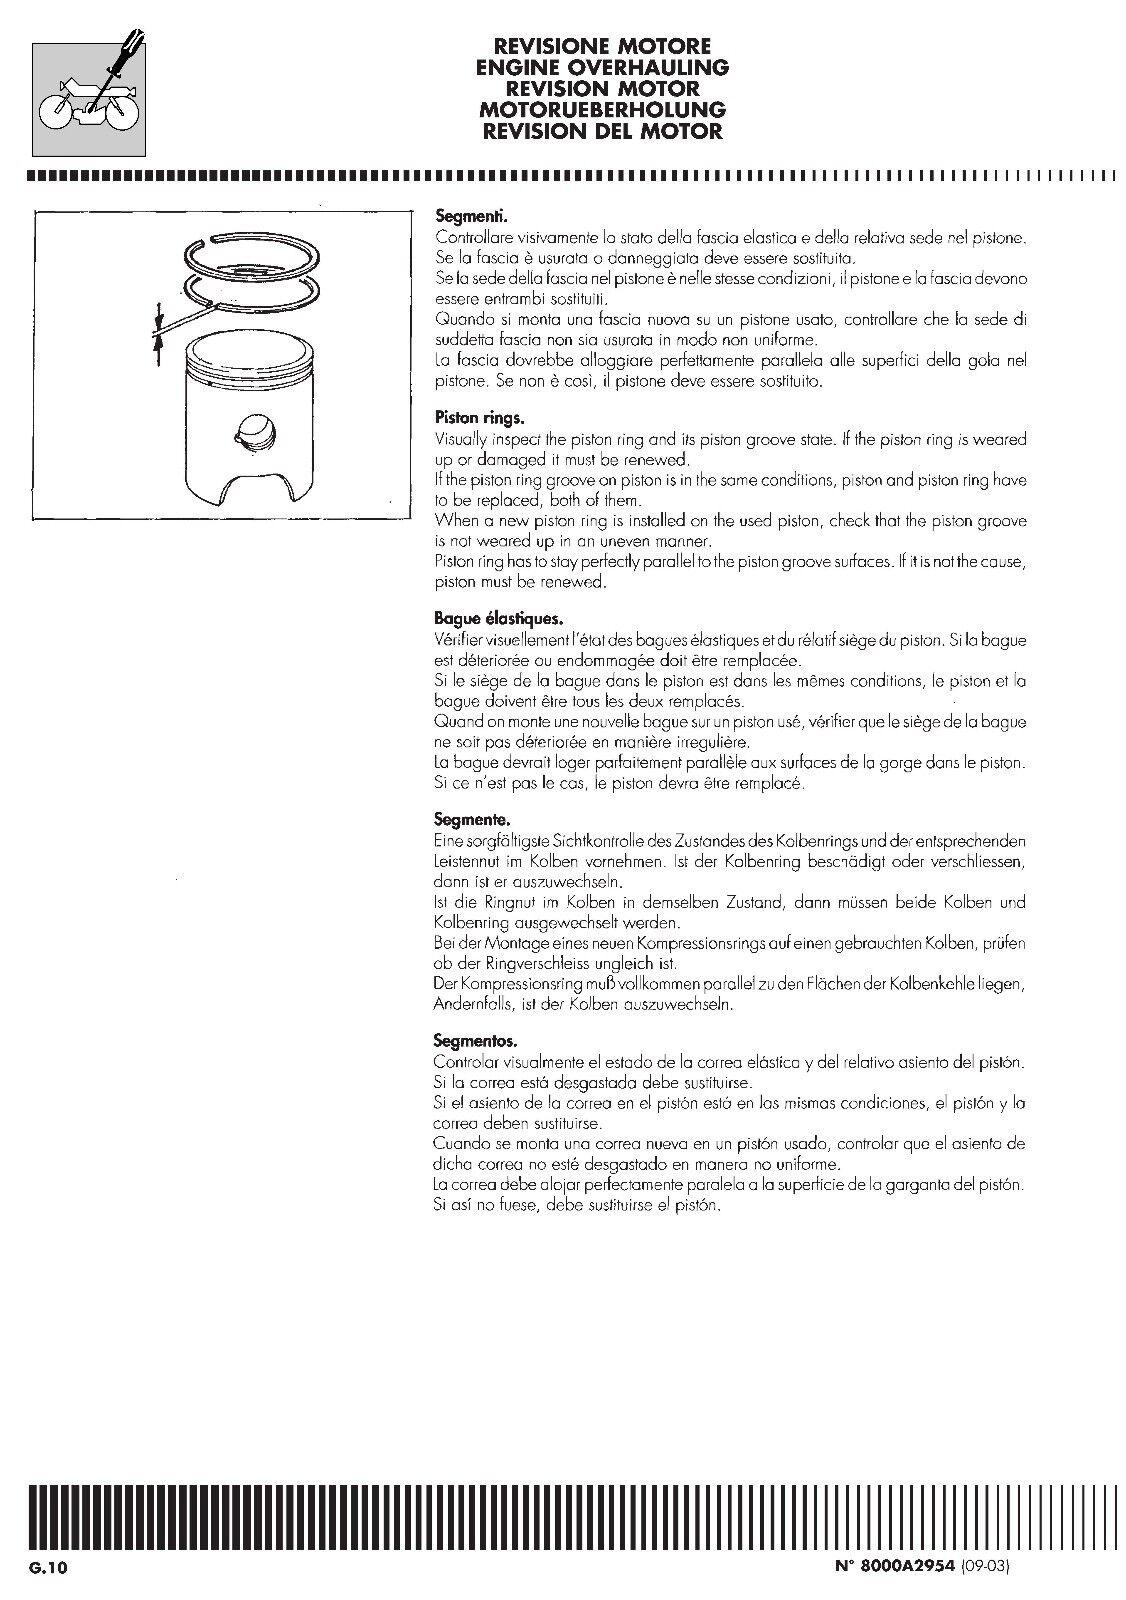 6 of 12 Husqvarna workshop service manual 2004 WR 250 & CR 250